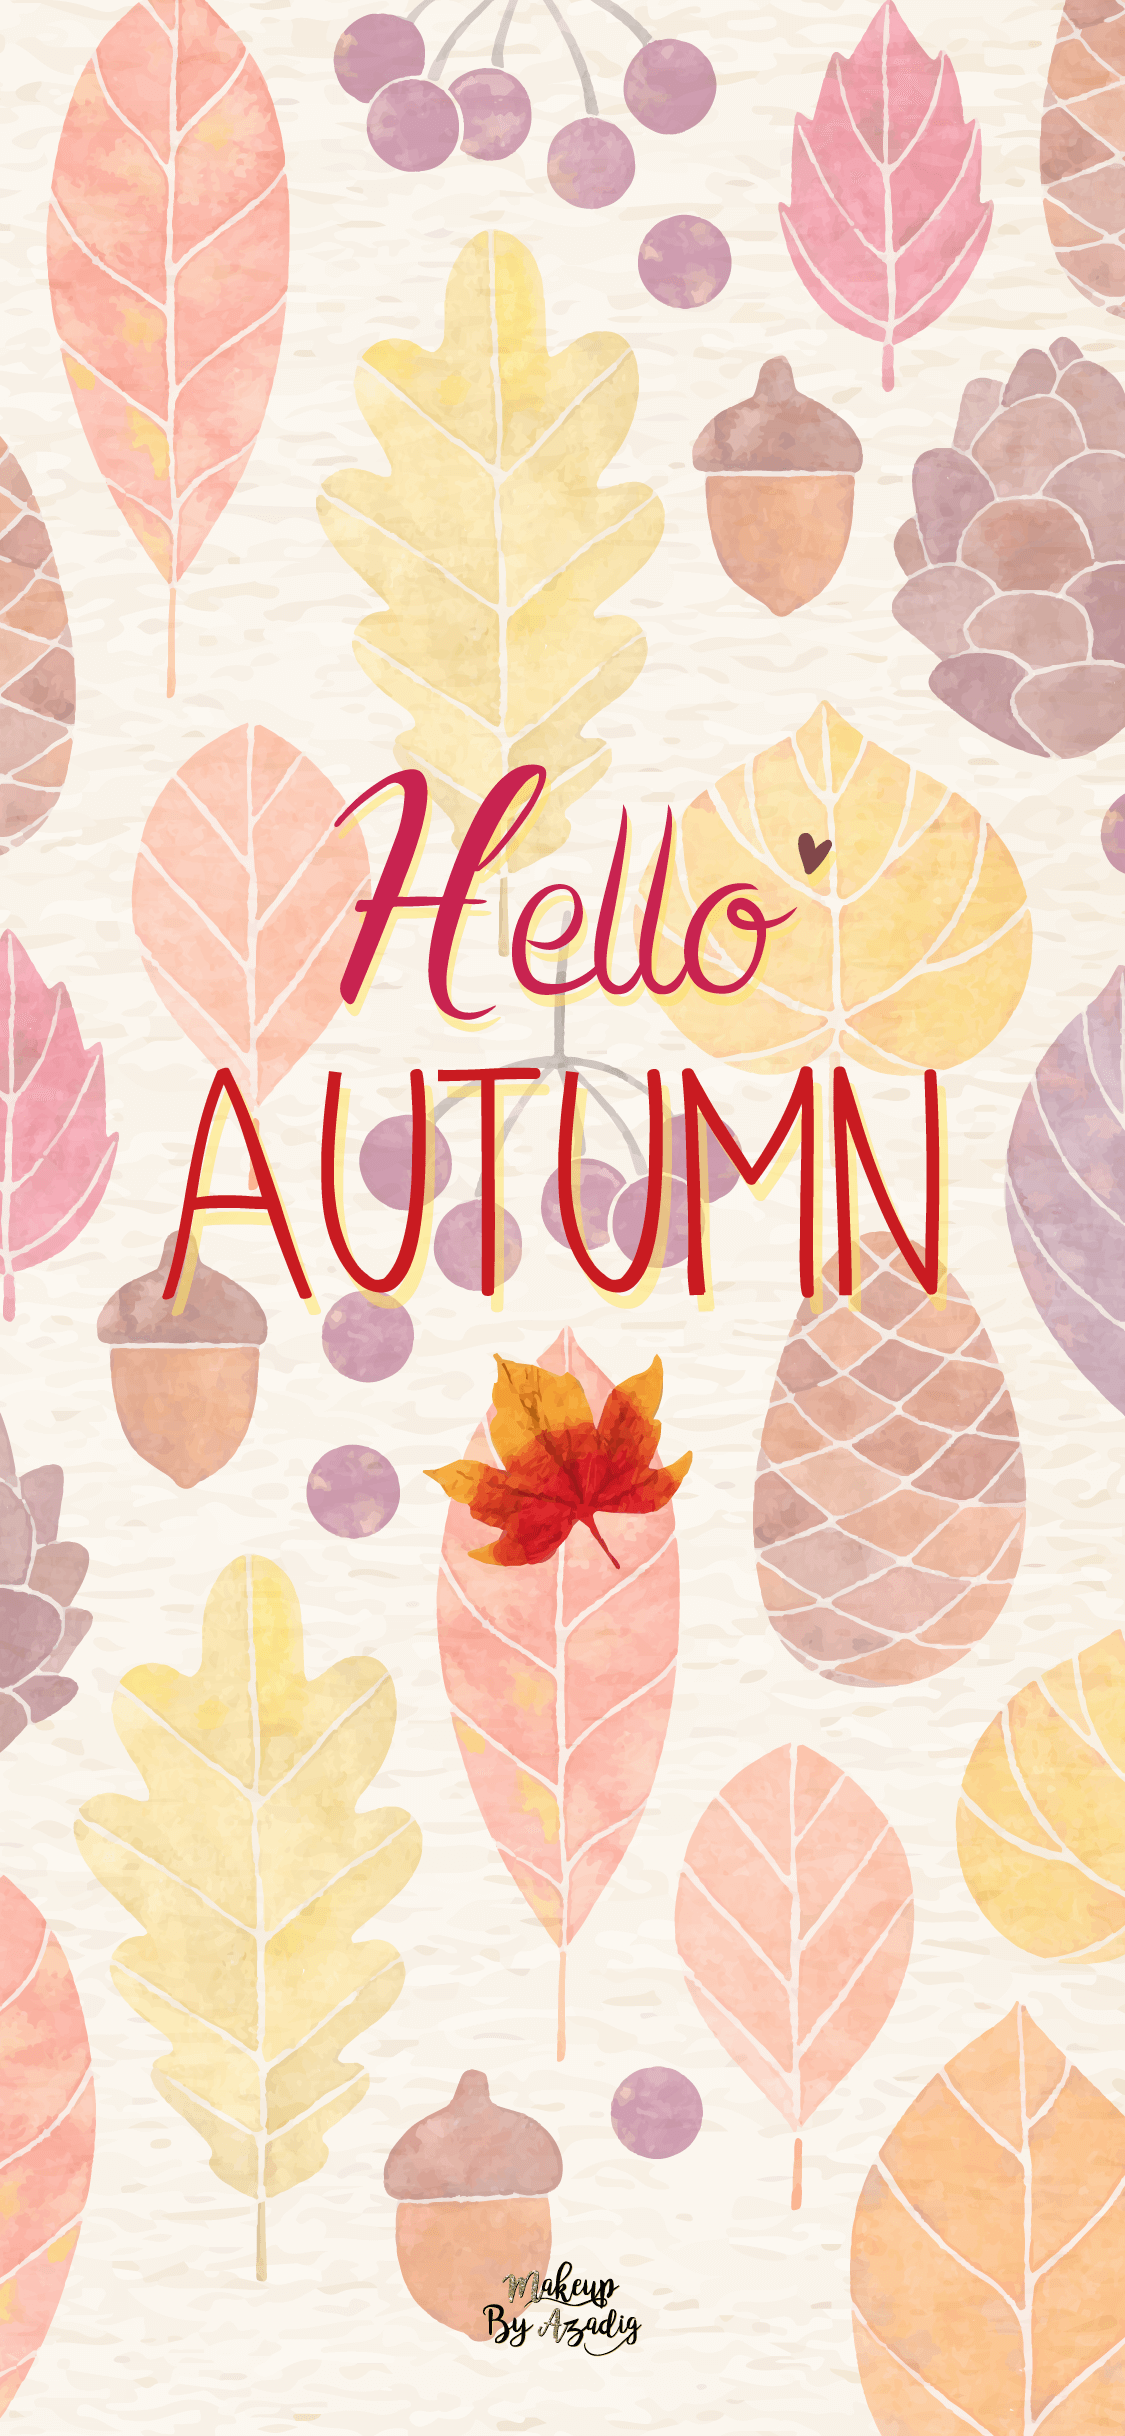 6 Fond D Cran Hello Autumn Wallpaper Makeupbyazadig - Fond D Écran Automne Iphone , HD Wallpaper & Backgrounds